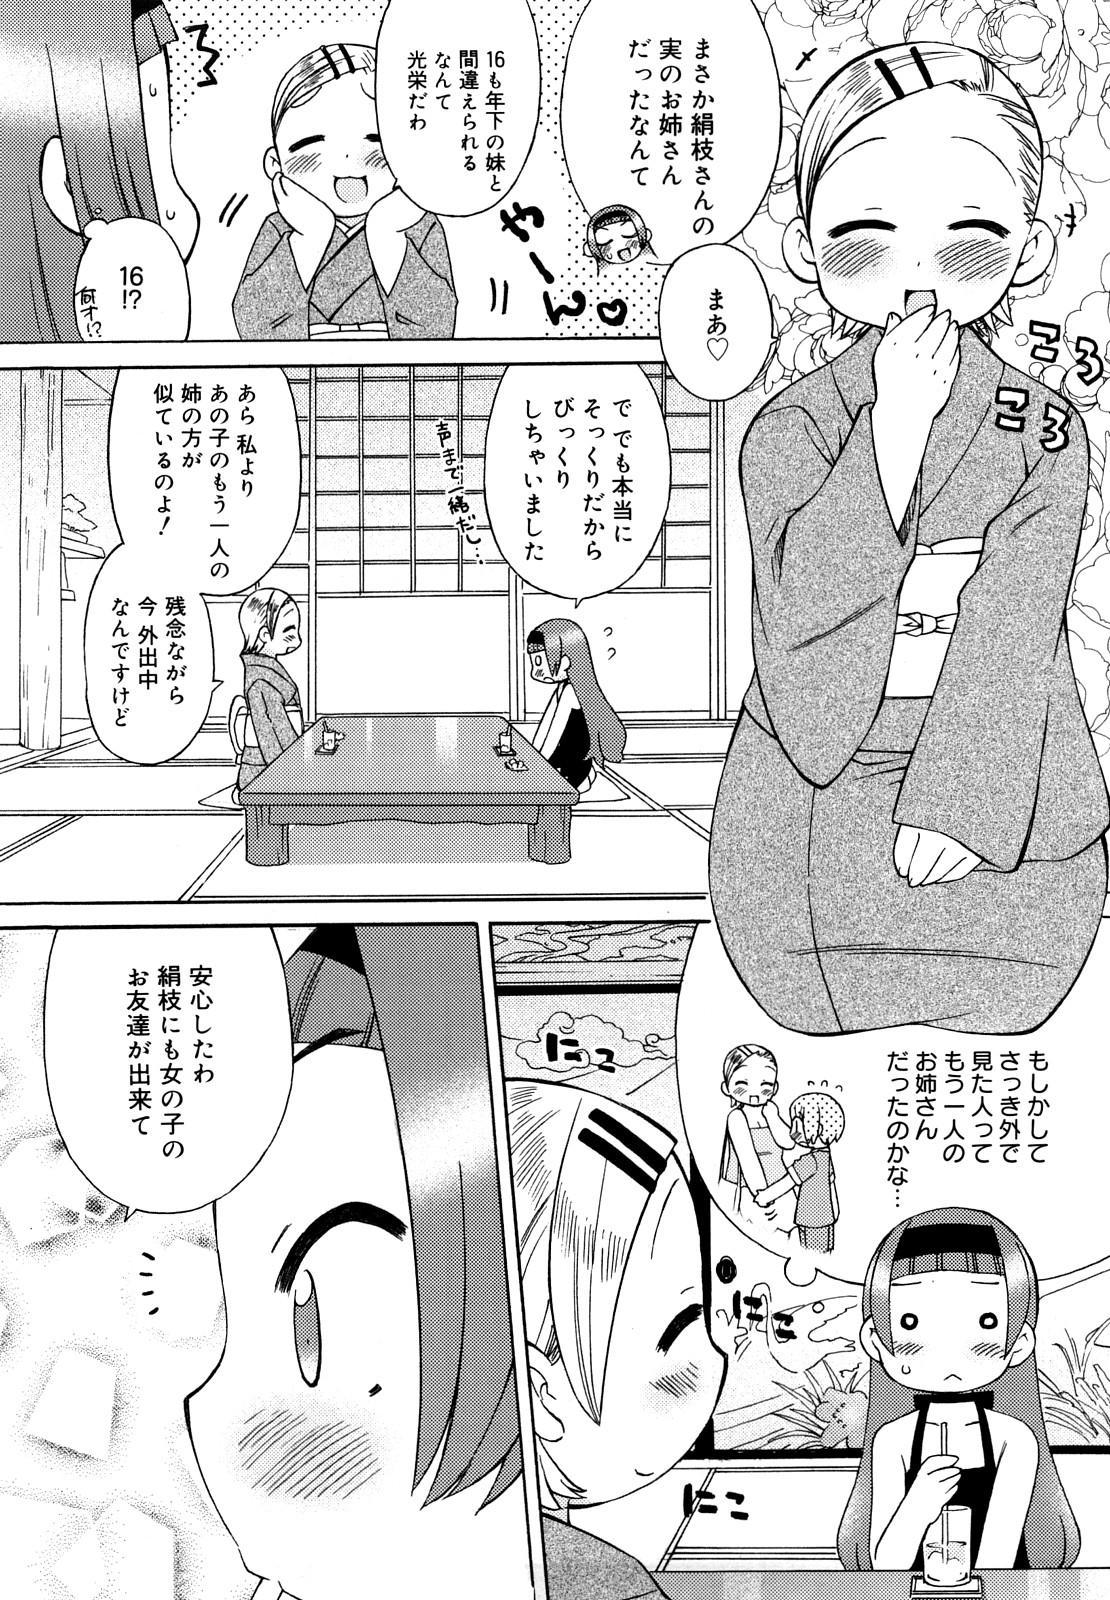 Hatsuden Pandakun! Shinsouban 196